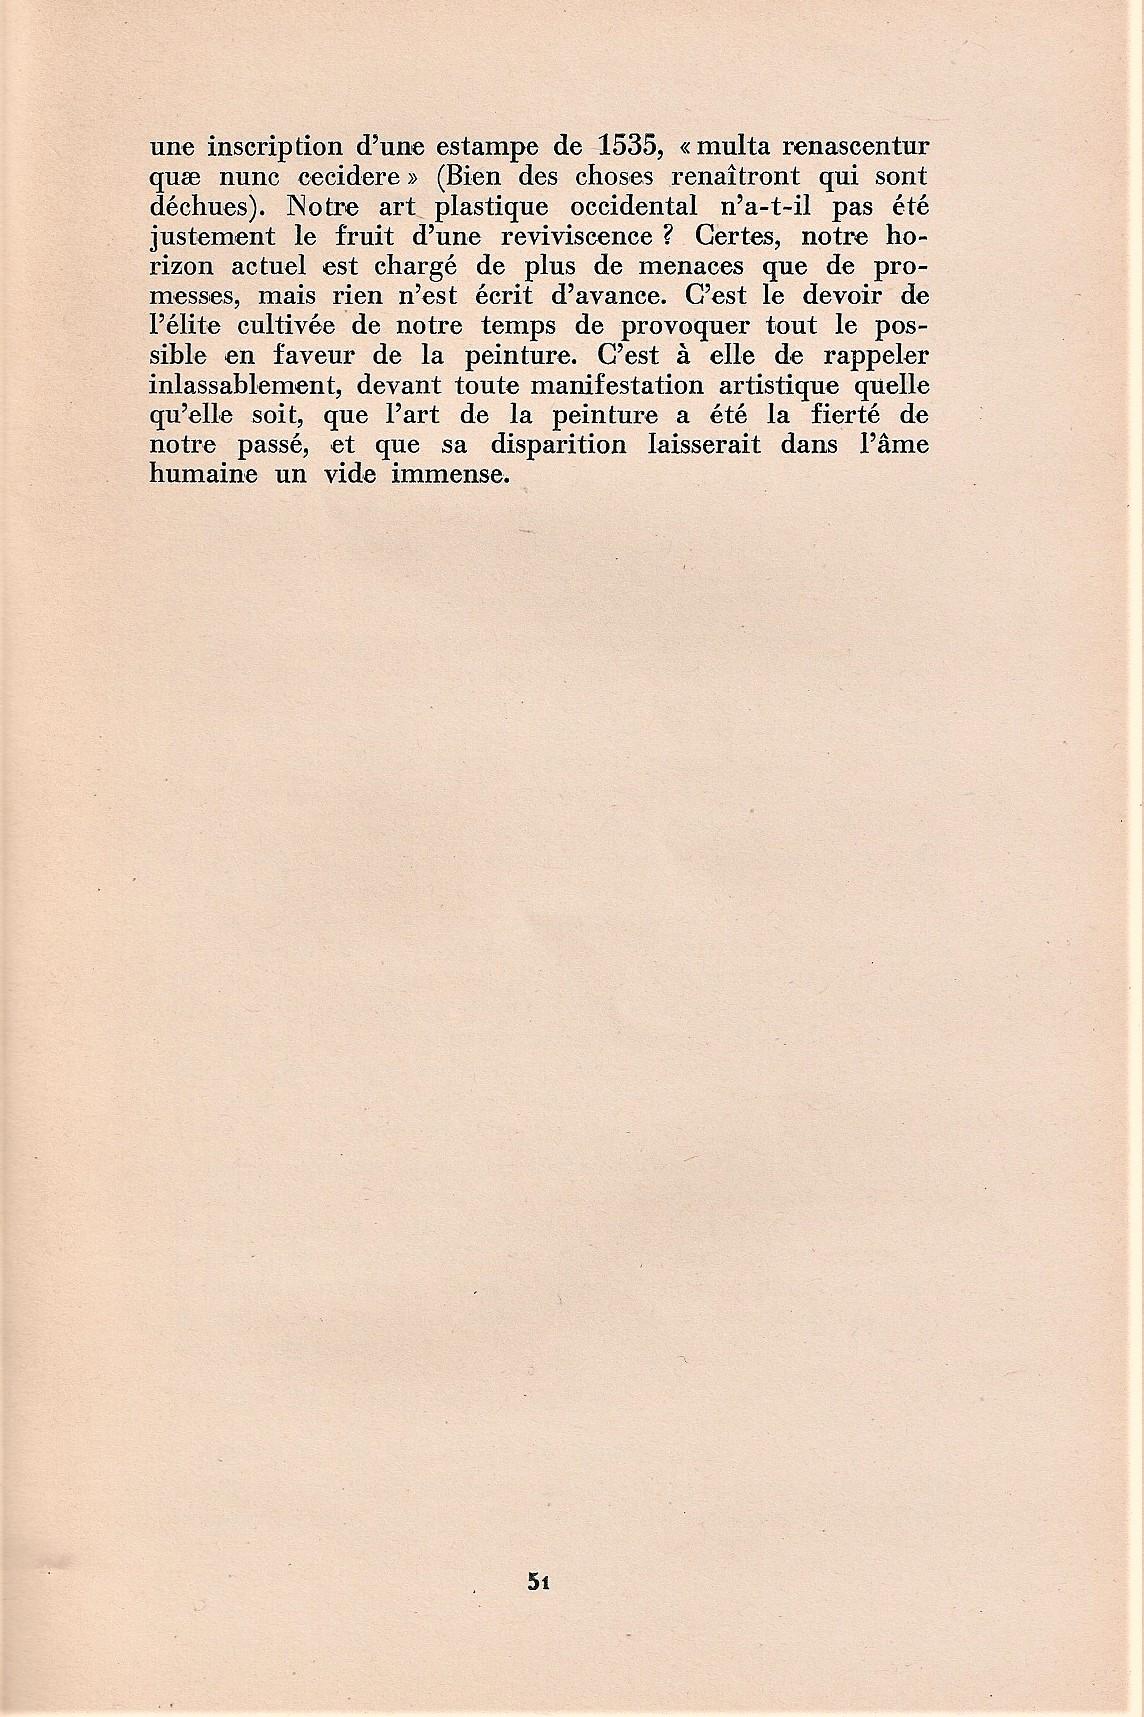 versini-page-51.jpg